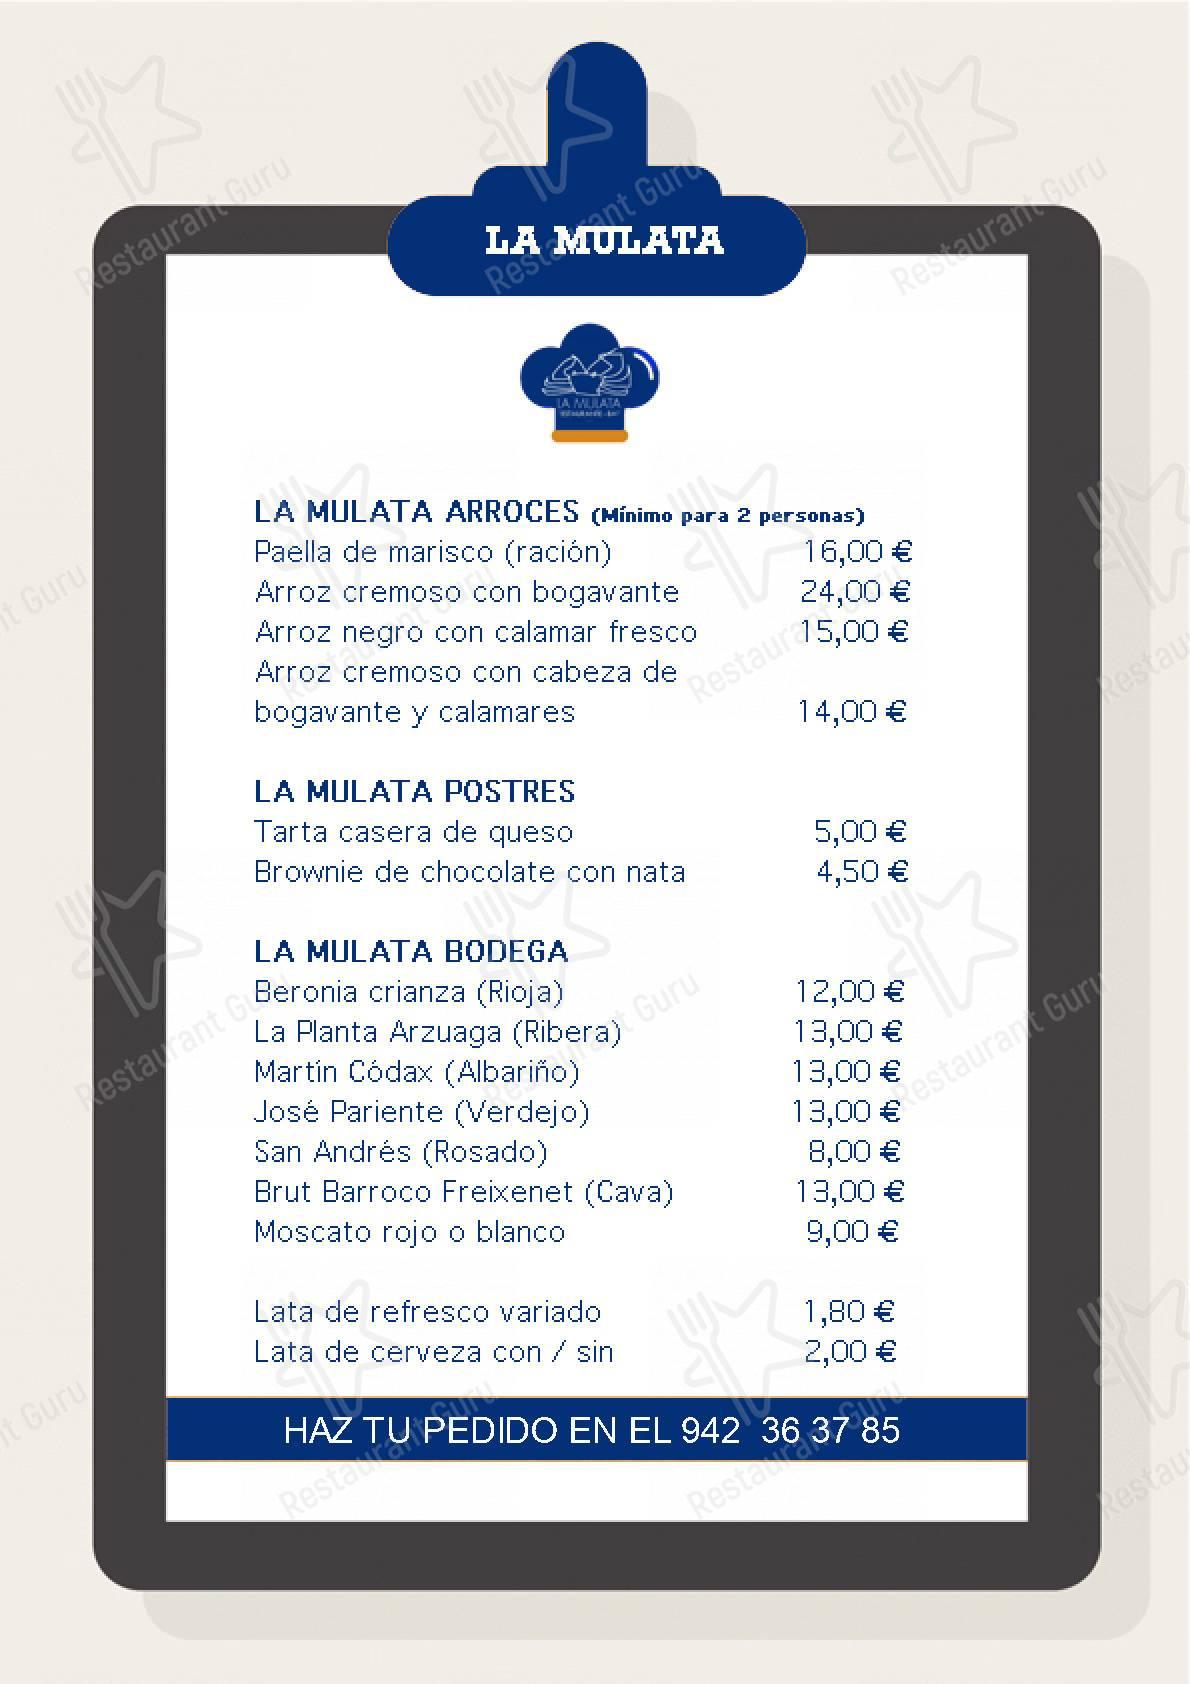 La Mulata menu - dishes and beverages